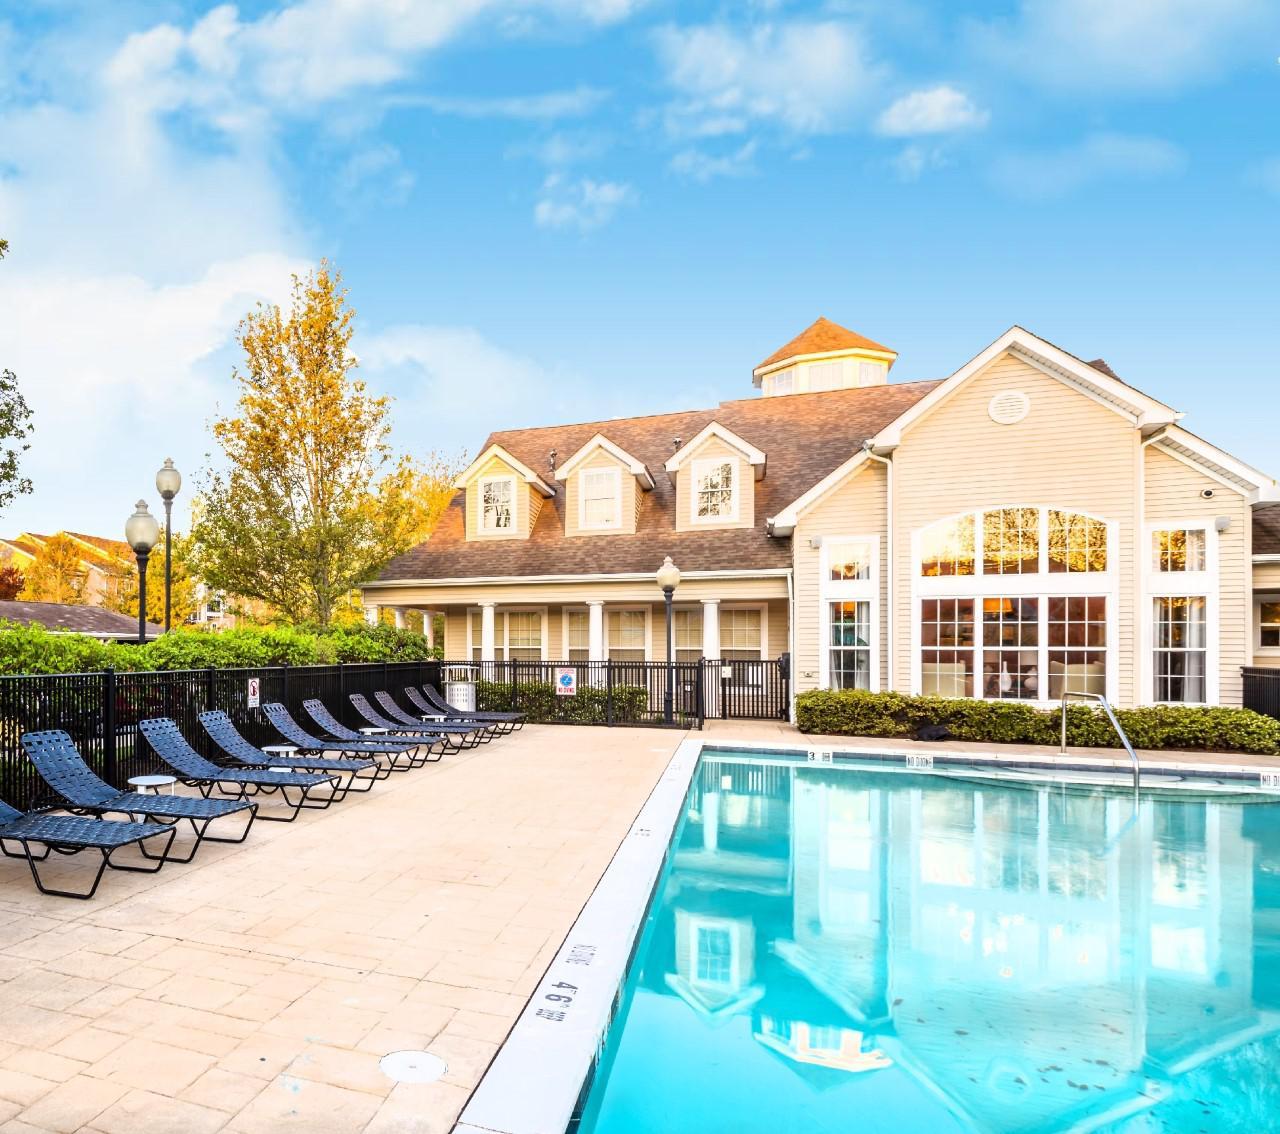 Luxury Apartment Complex In Orange Sold For $35 Million